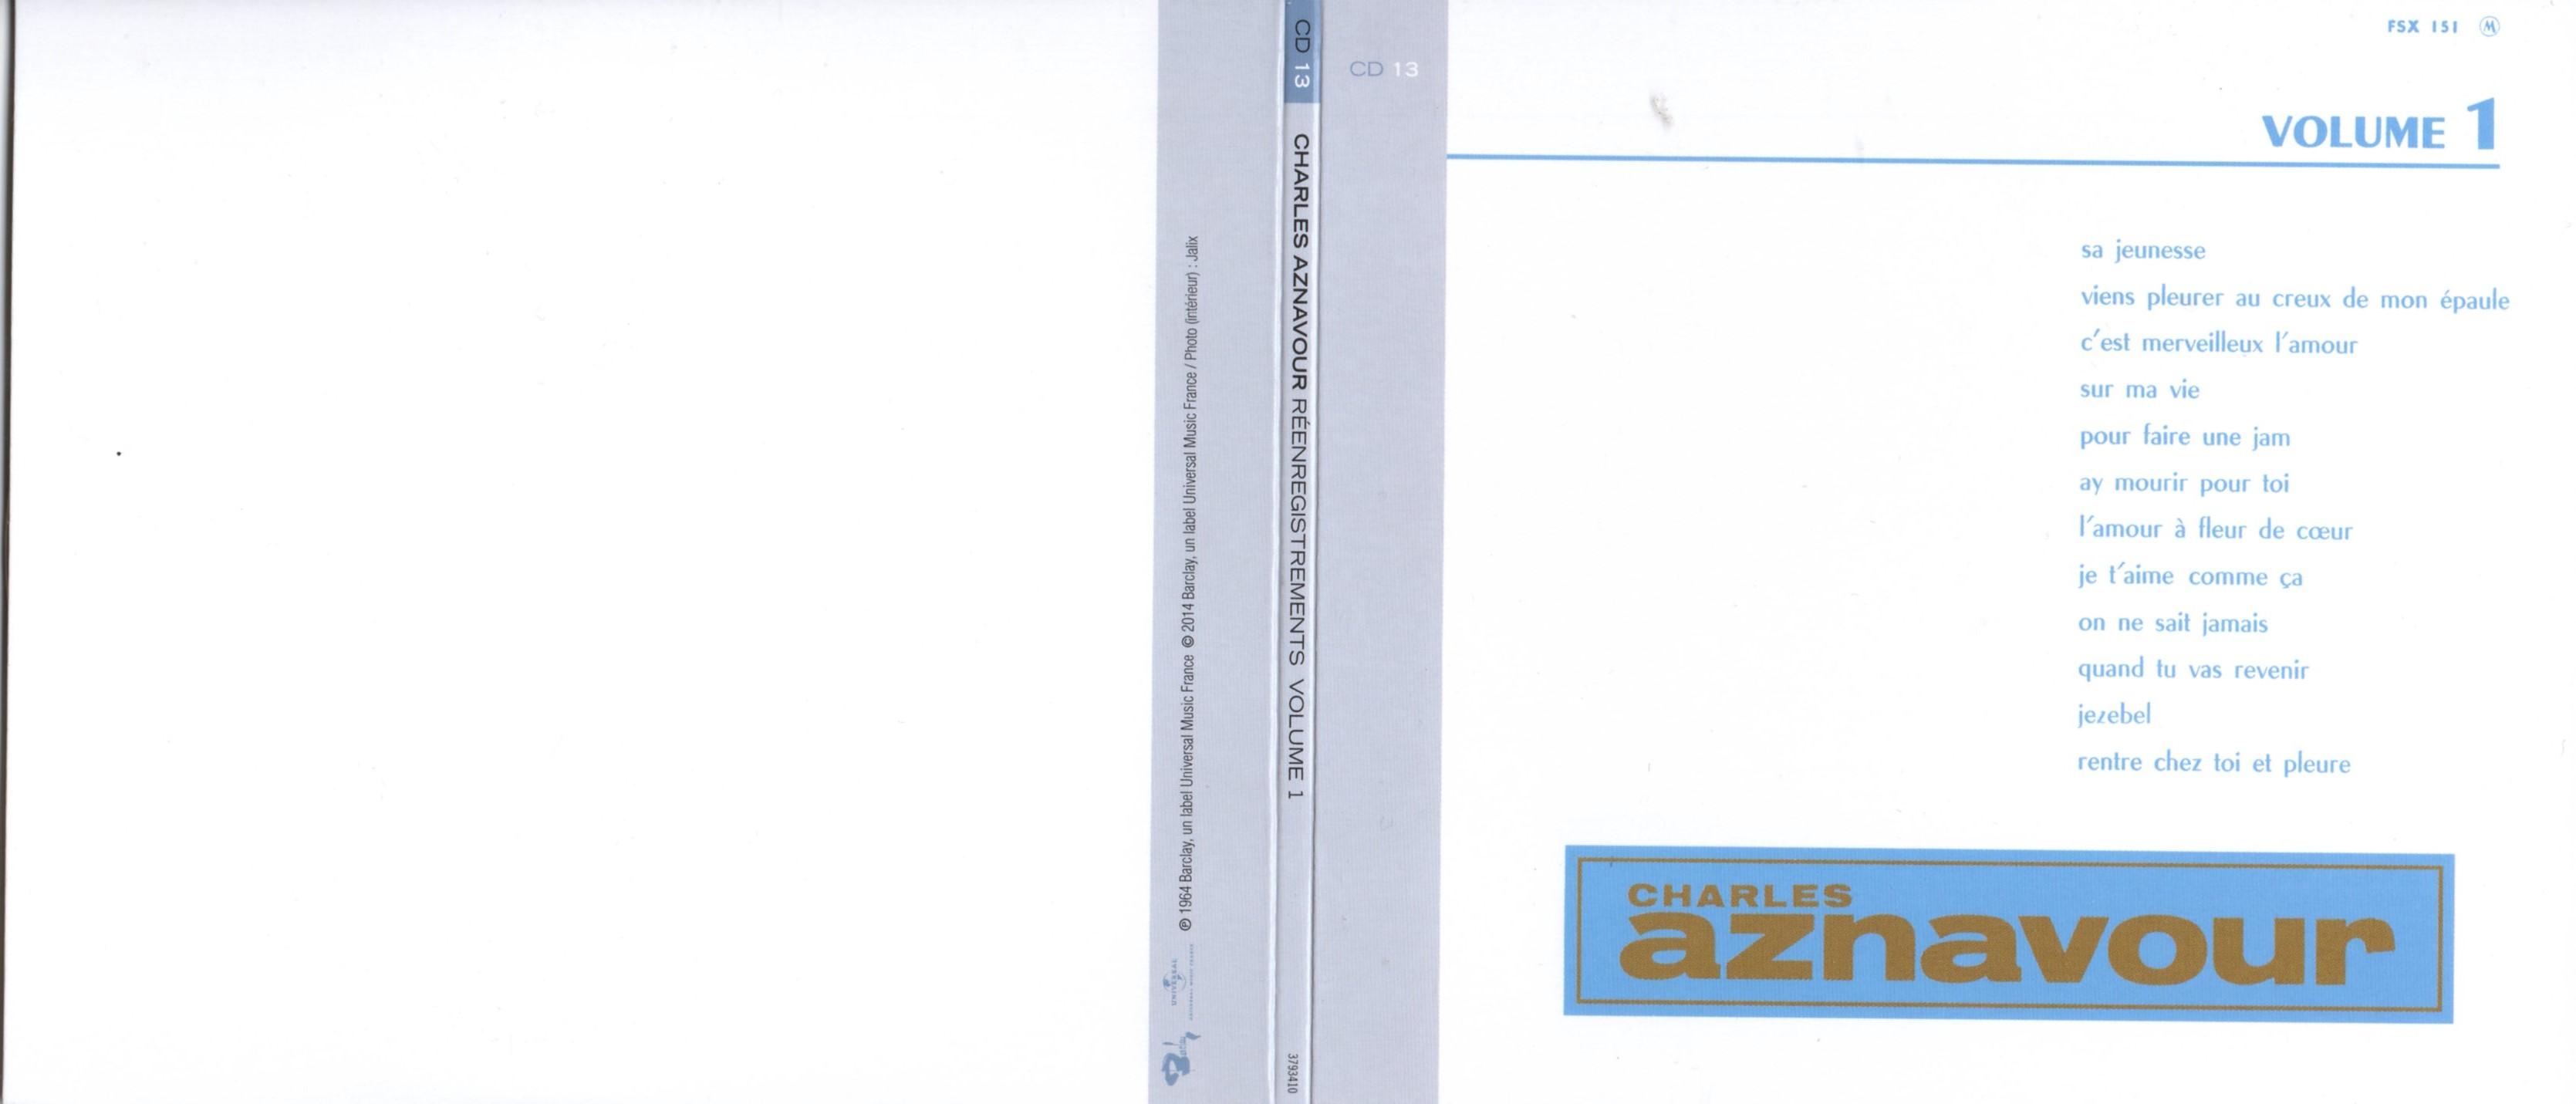 CHARLES AZNAVOUR - Réenregistrements Columbia Volume 1 (1964) Gatefold Card board sleeve Replica - CD